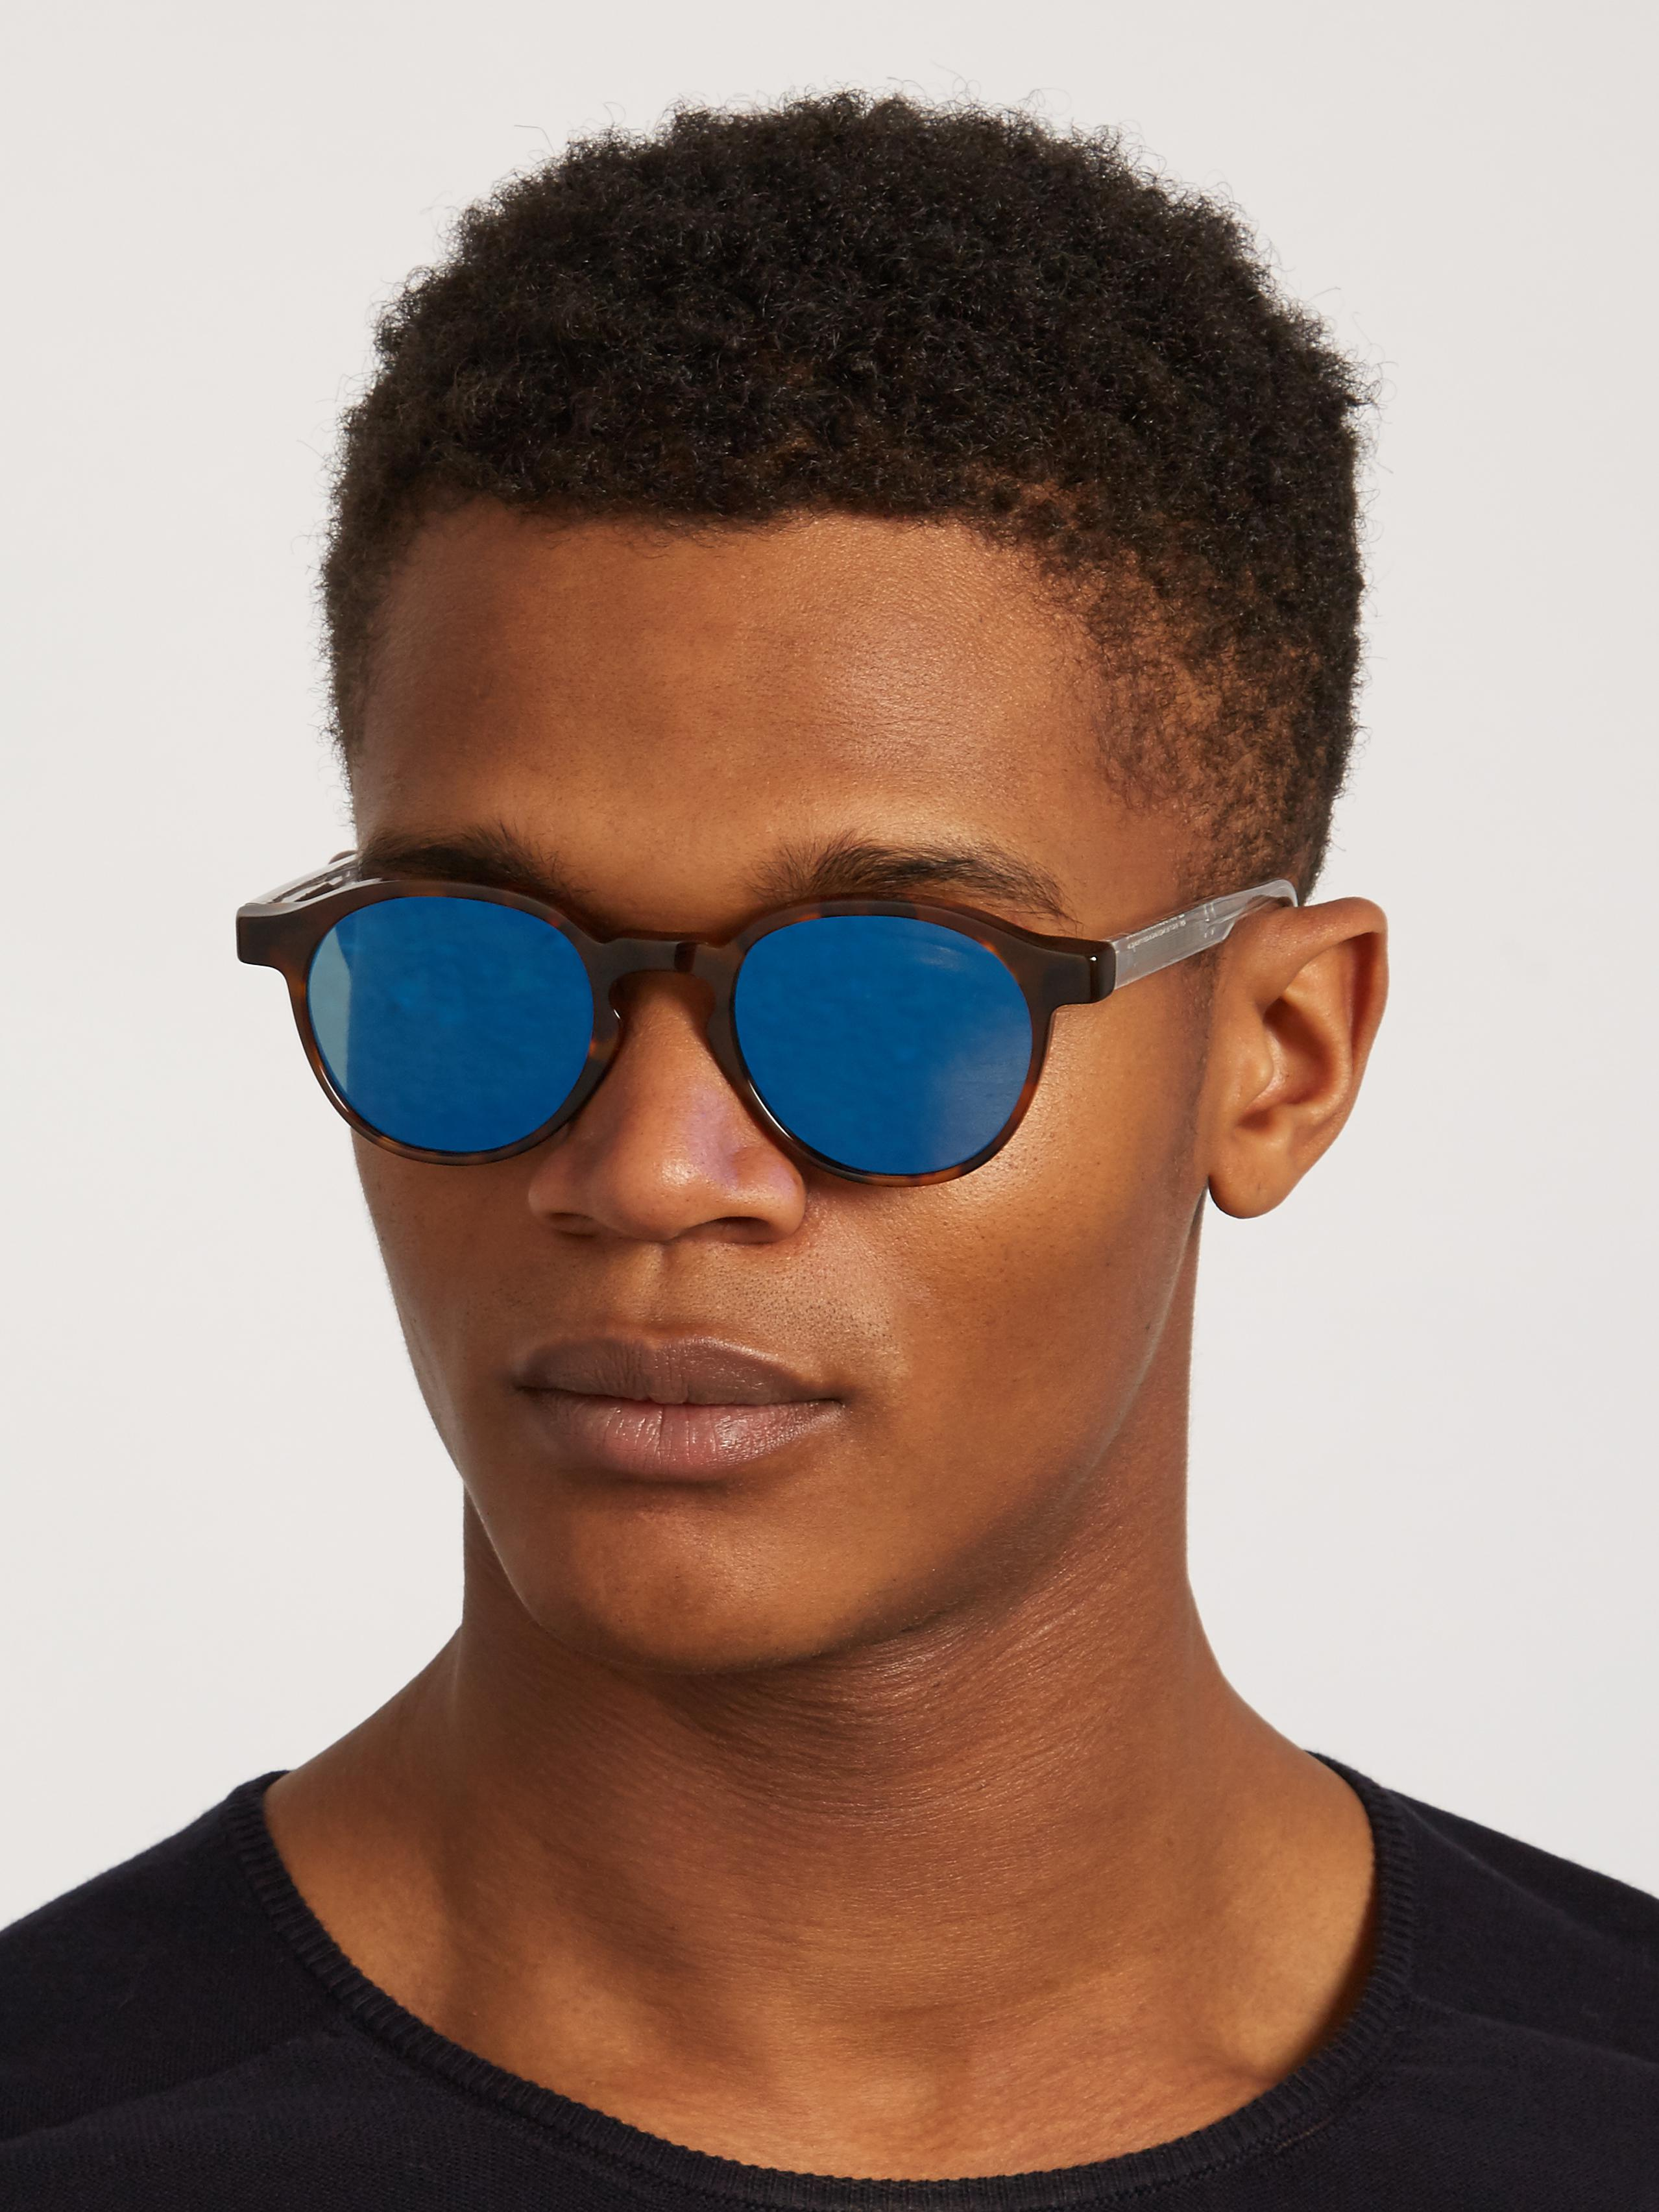 Retrosuperfuture The Iconic Series Mirrored Sunglasses for Men